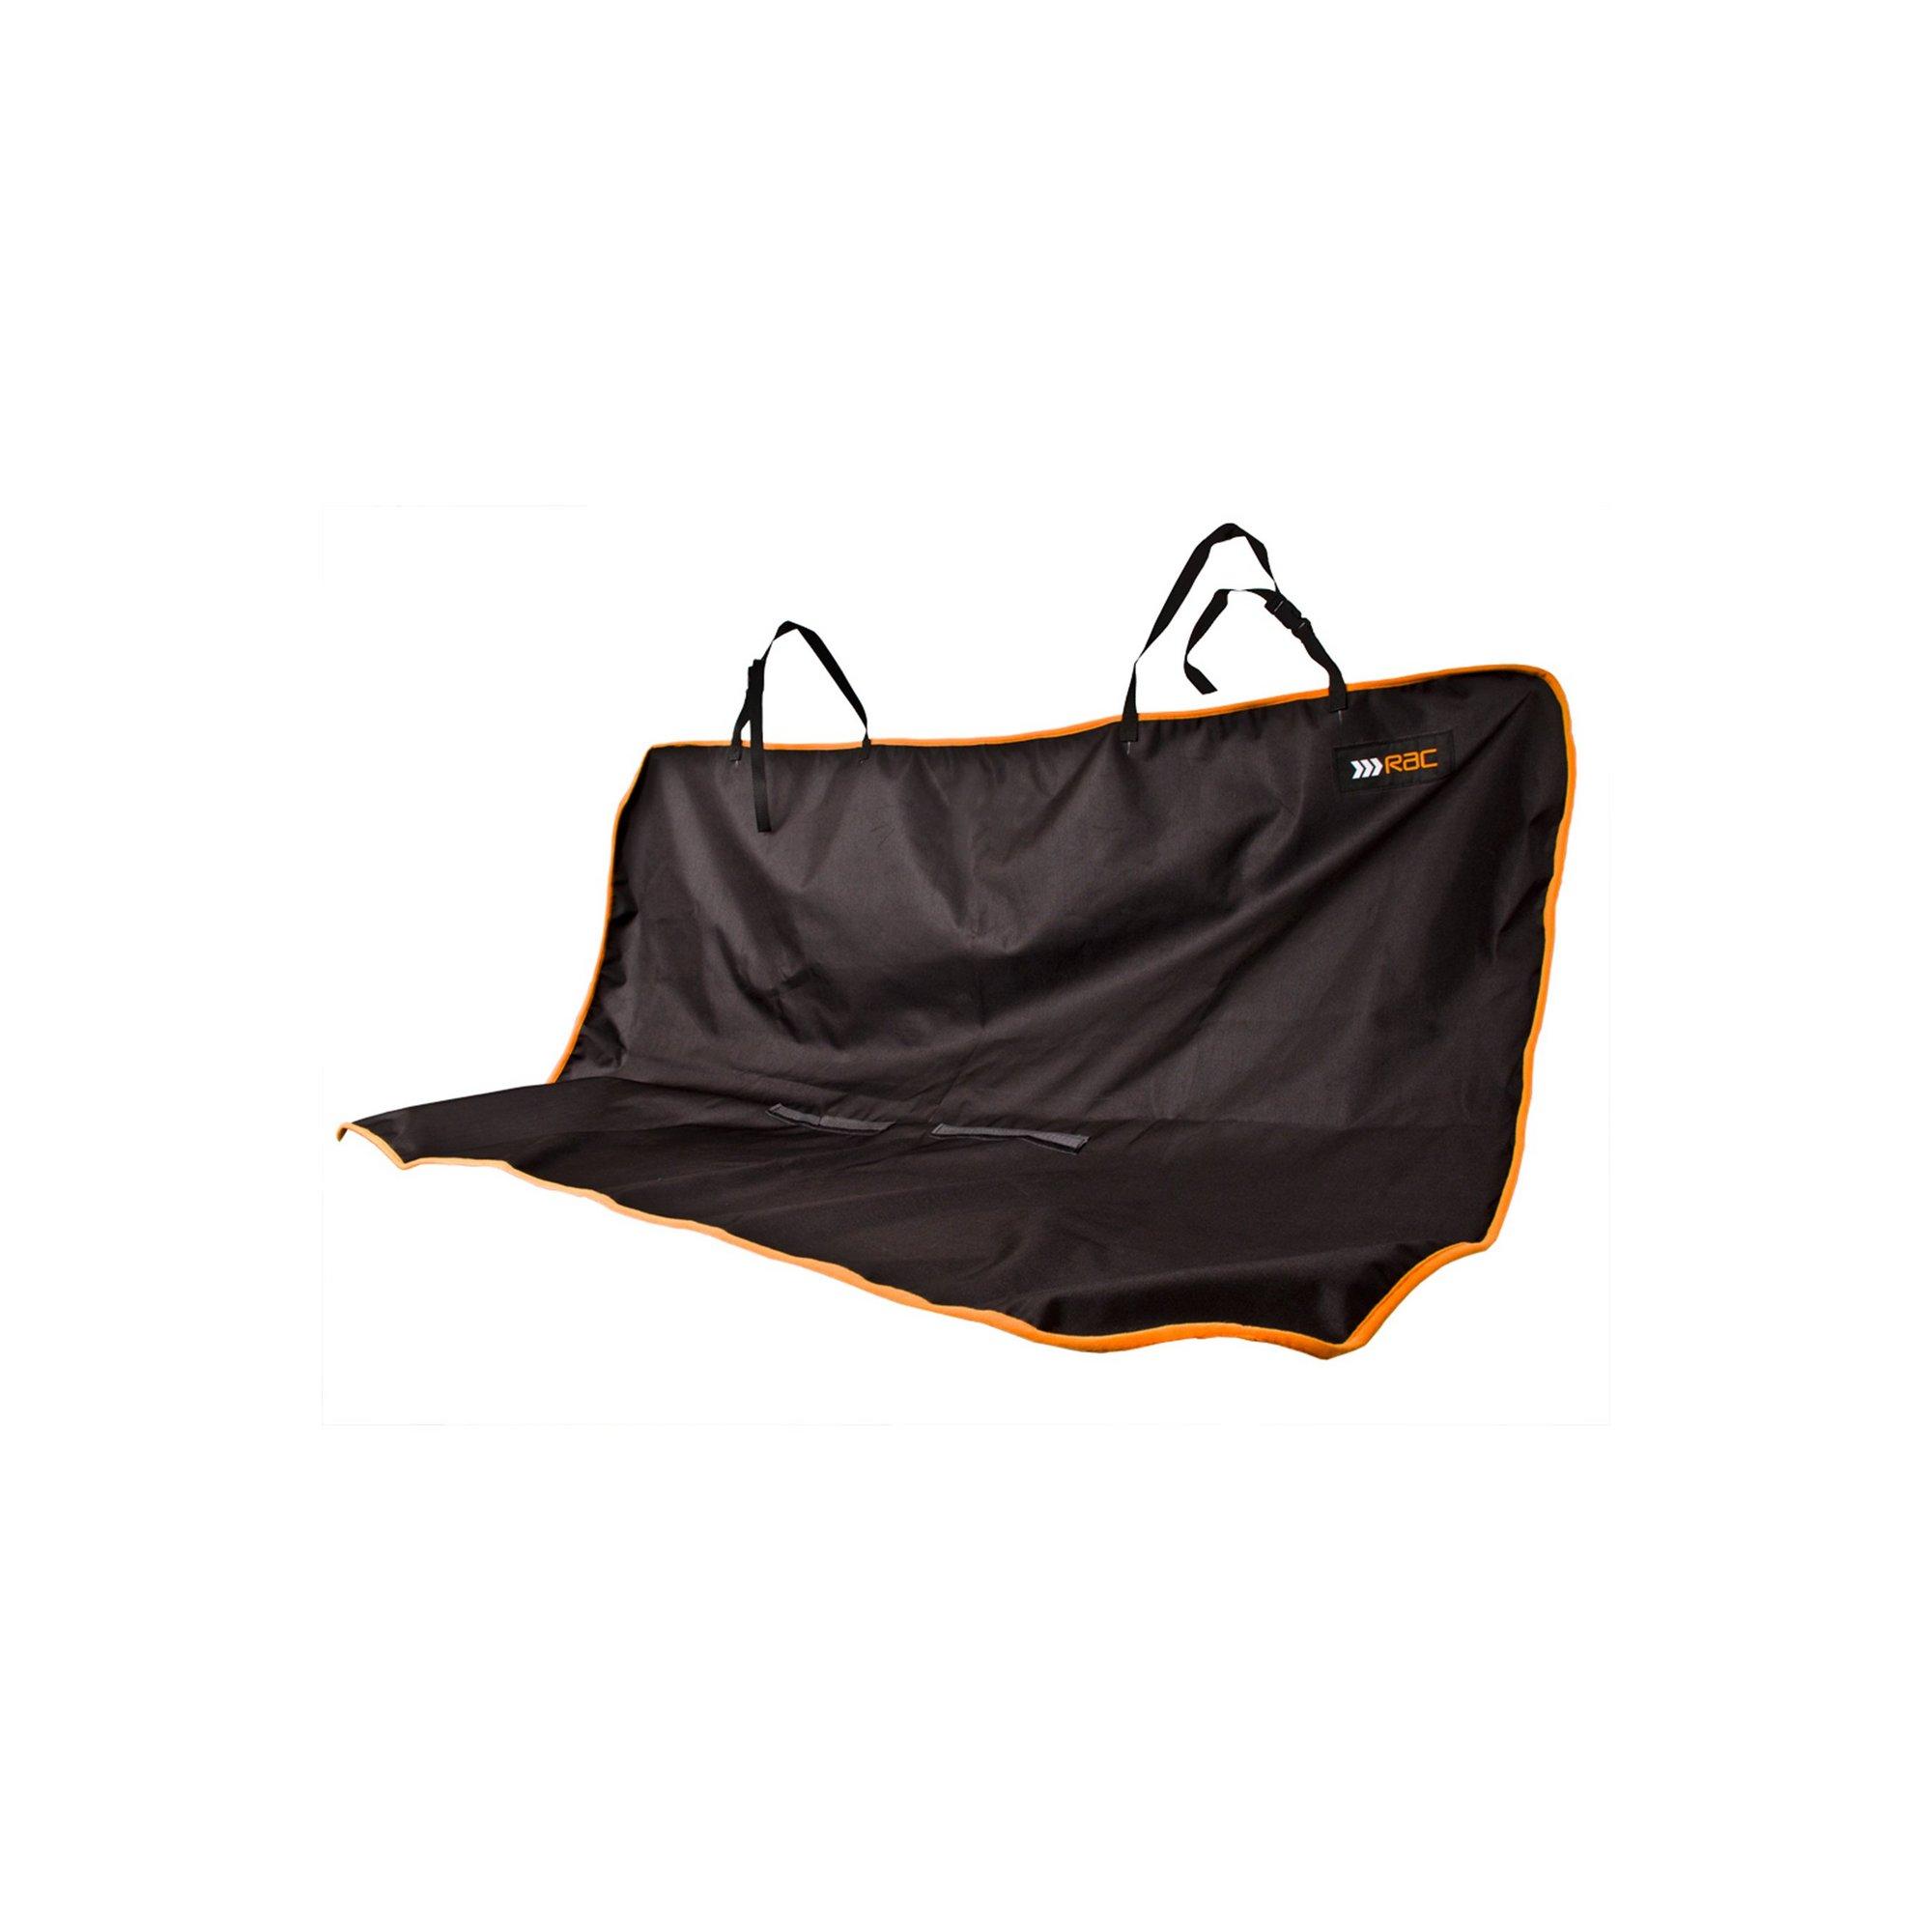 Image of RAC Pet Rear Car Seat Cover